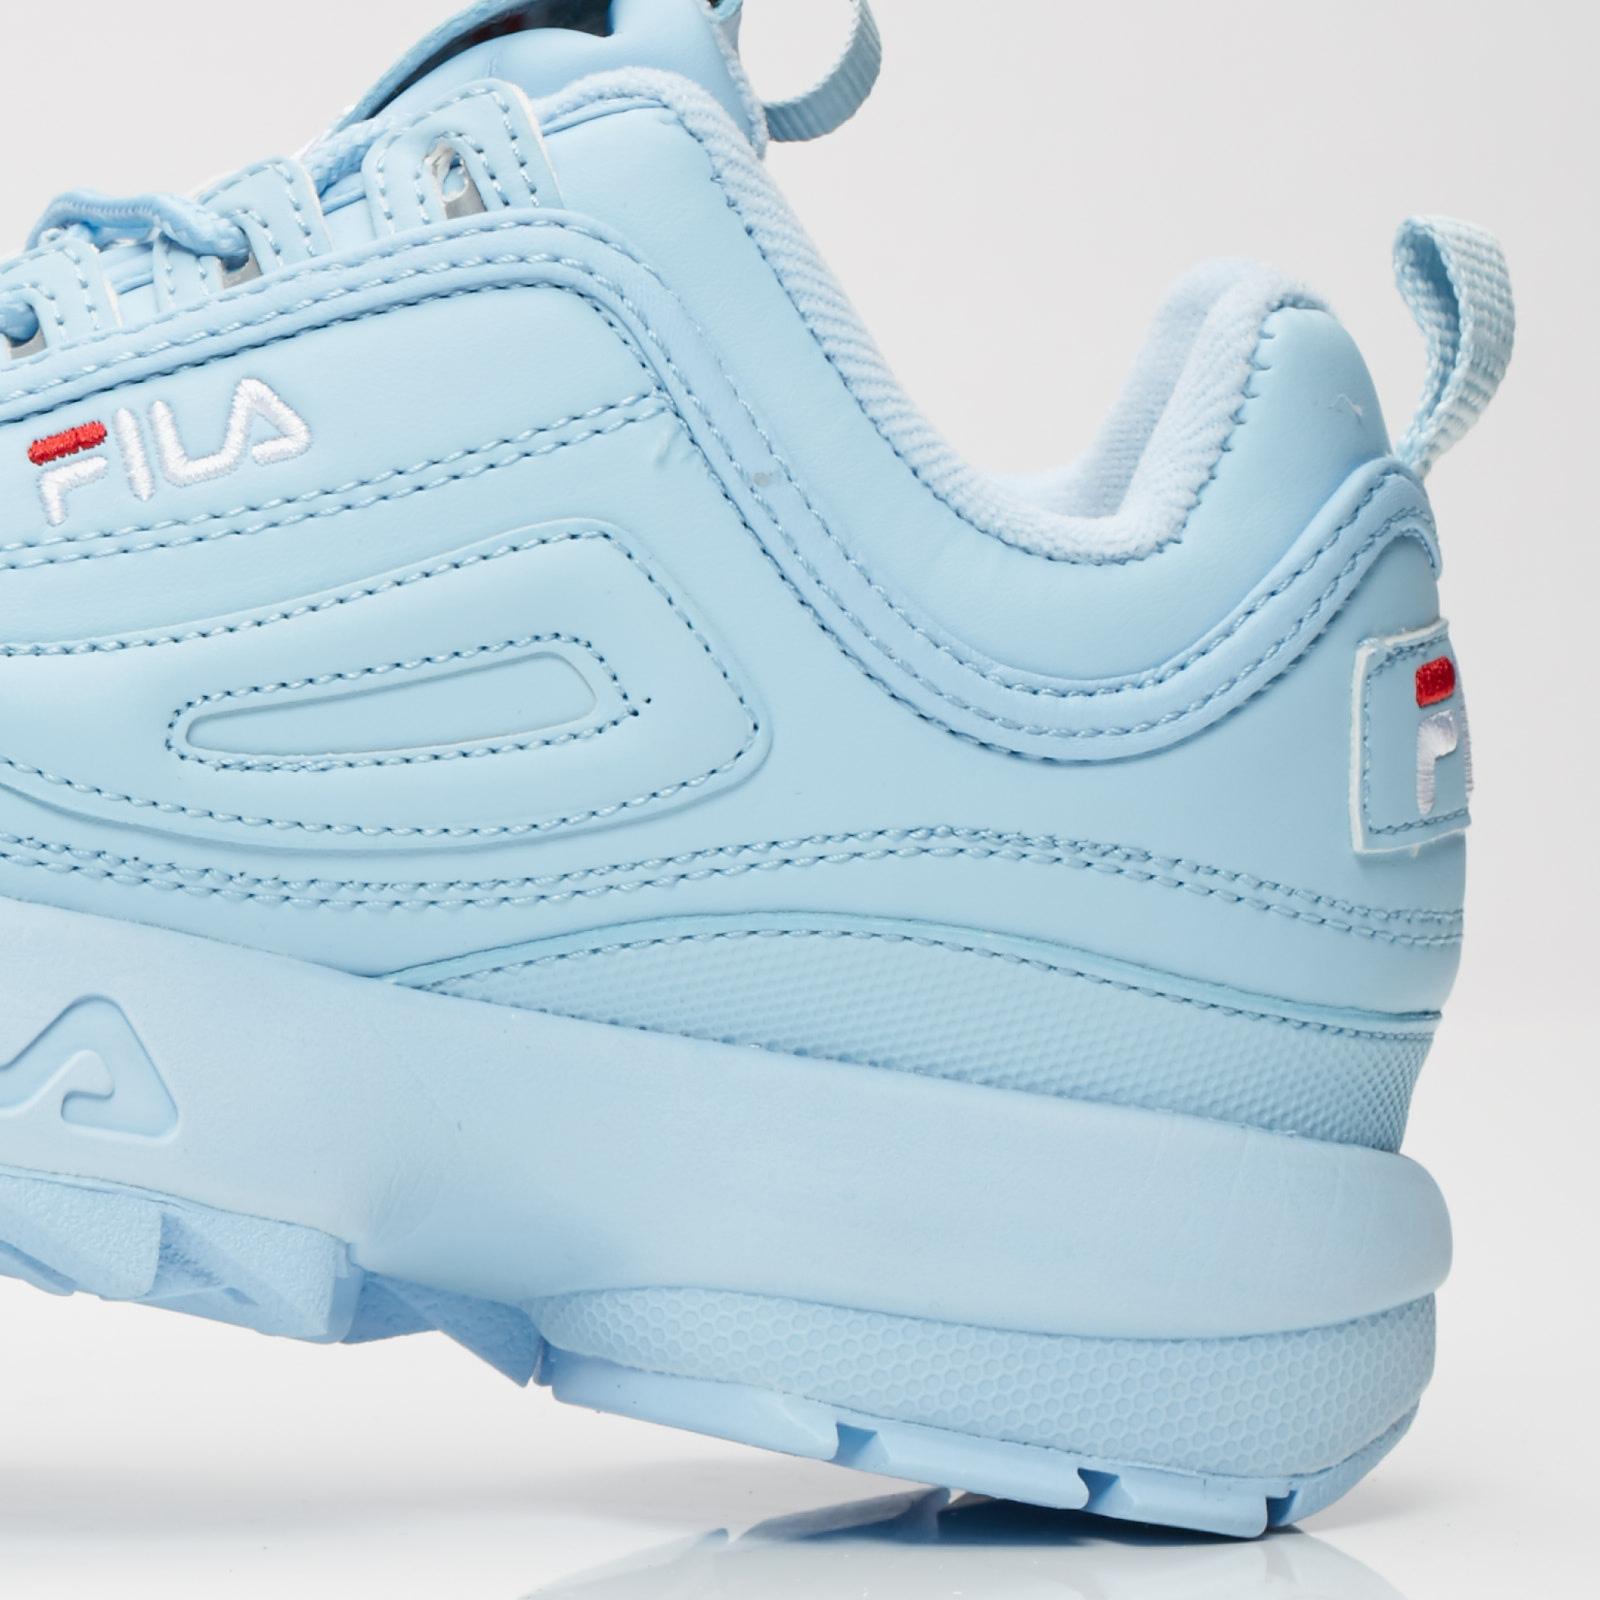 5829be92a8e5 Fila Disruptor II Premium - 5fm00042-421 - Sneakersnstuff